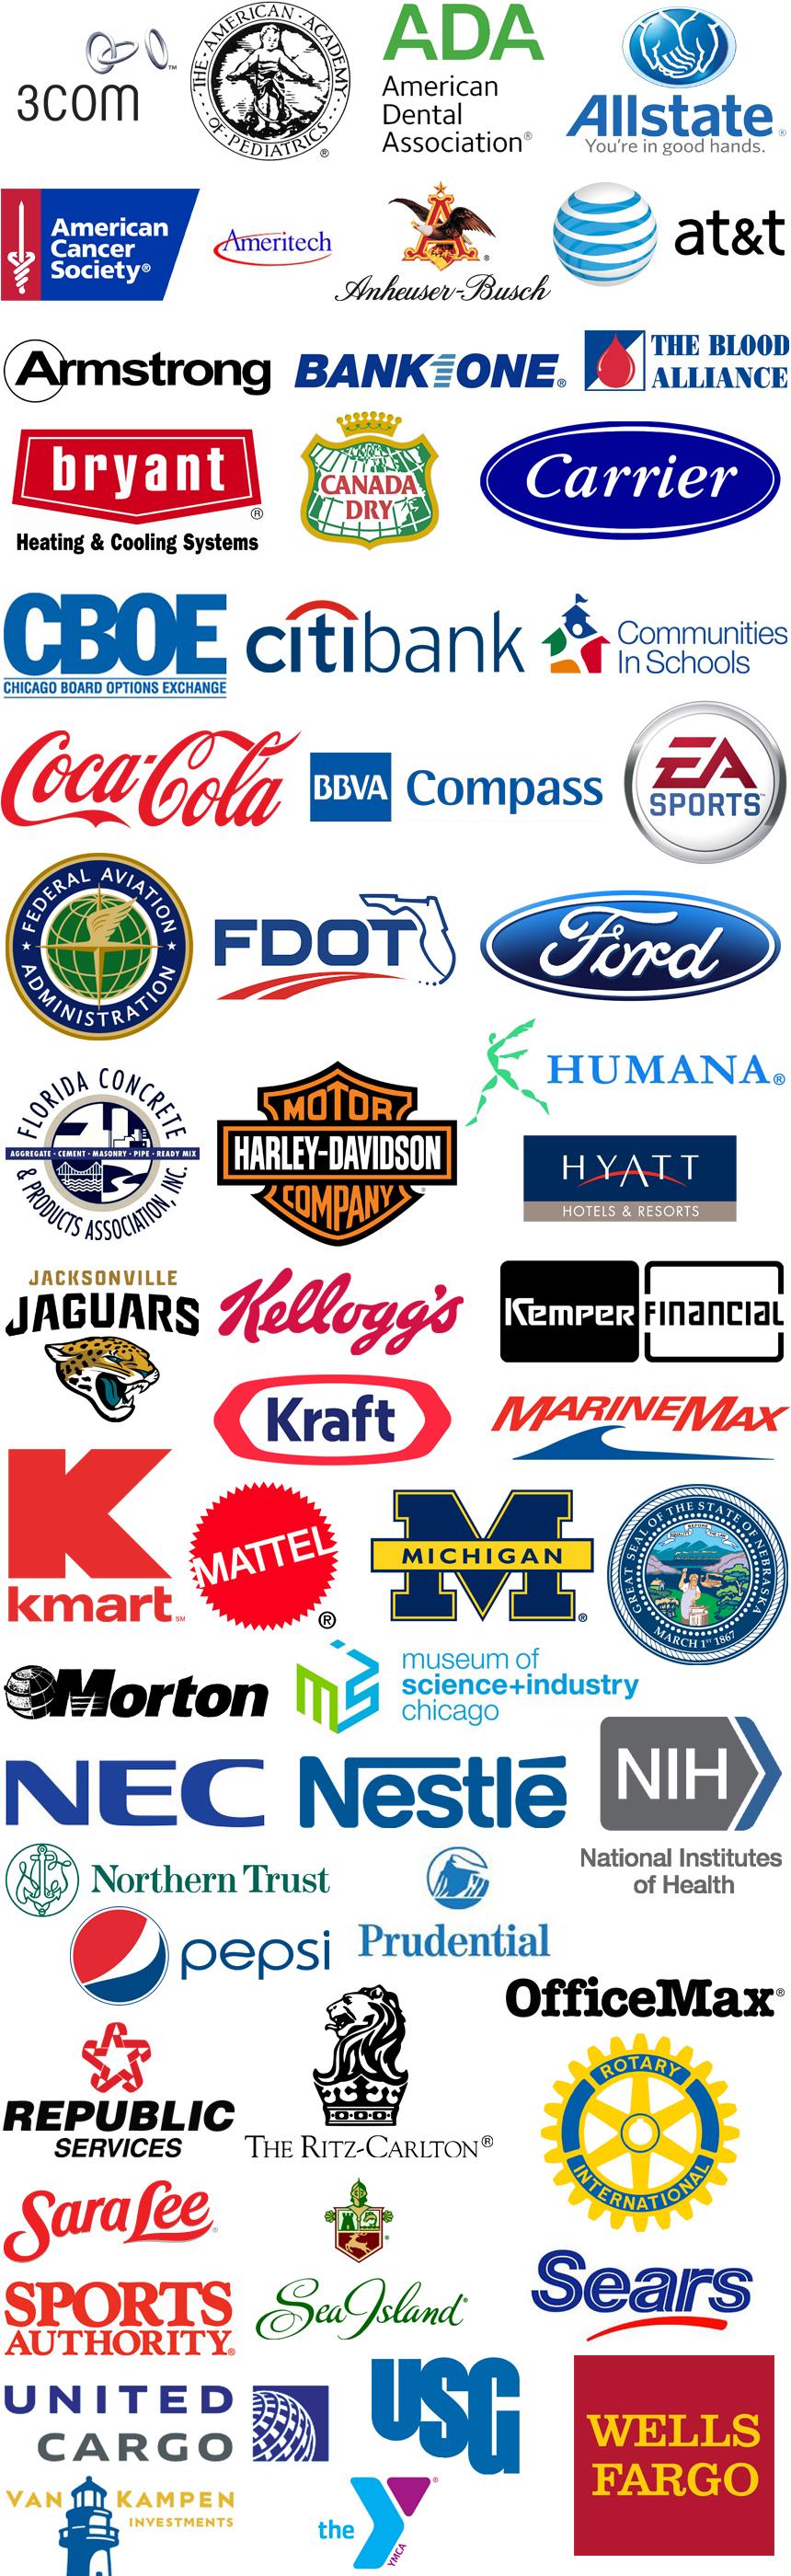 CCOM Client Logos Layout